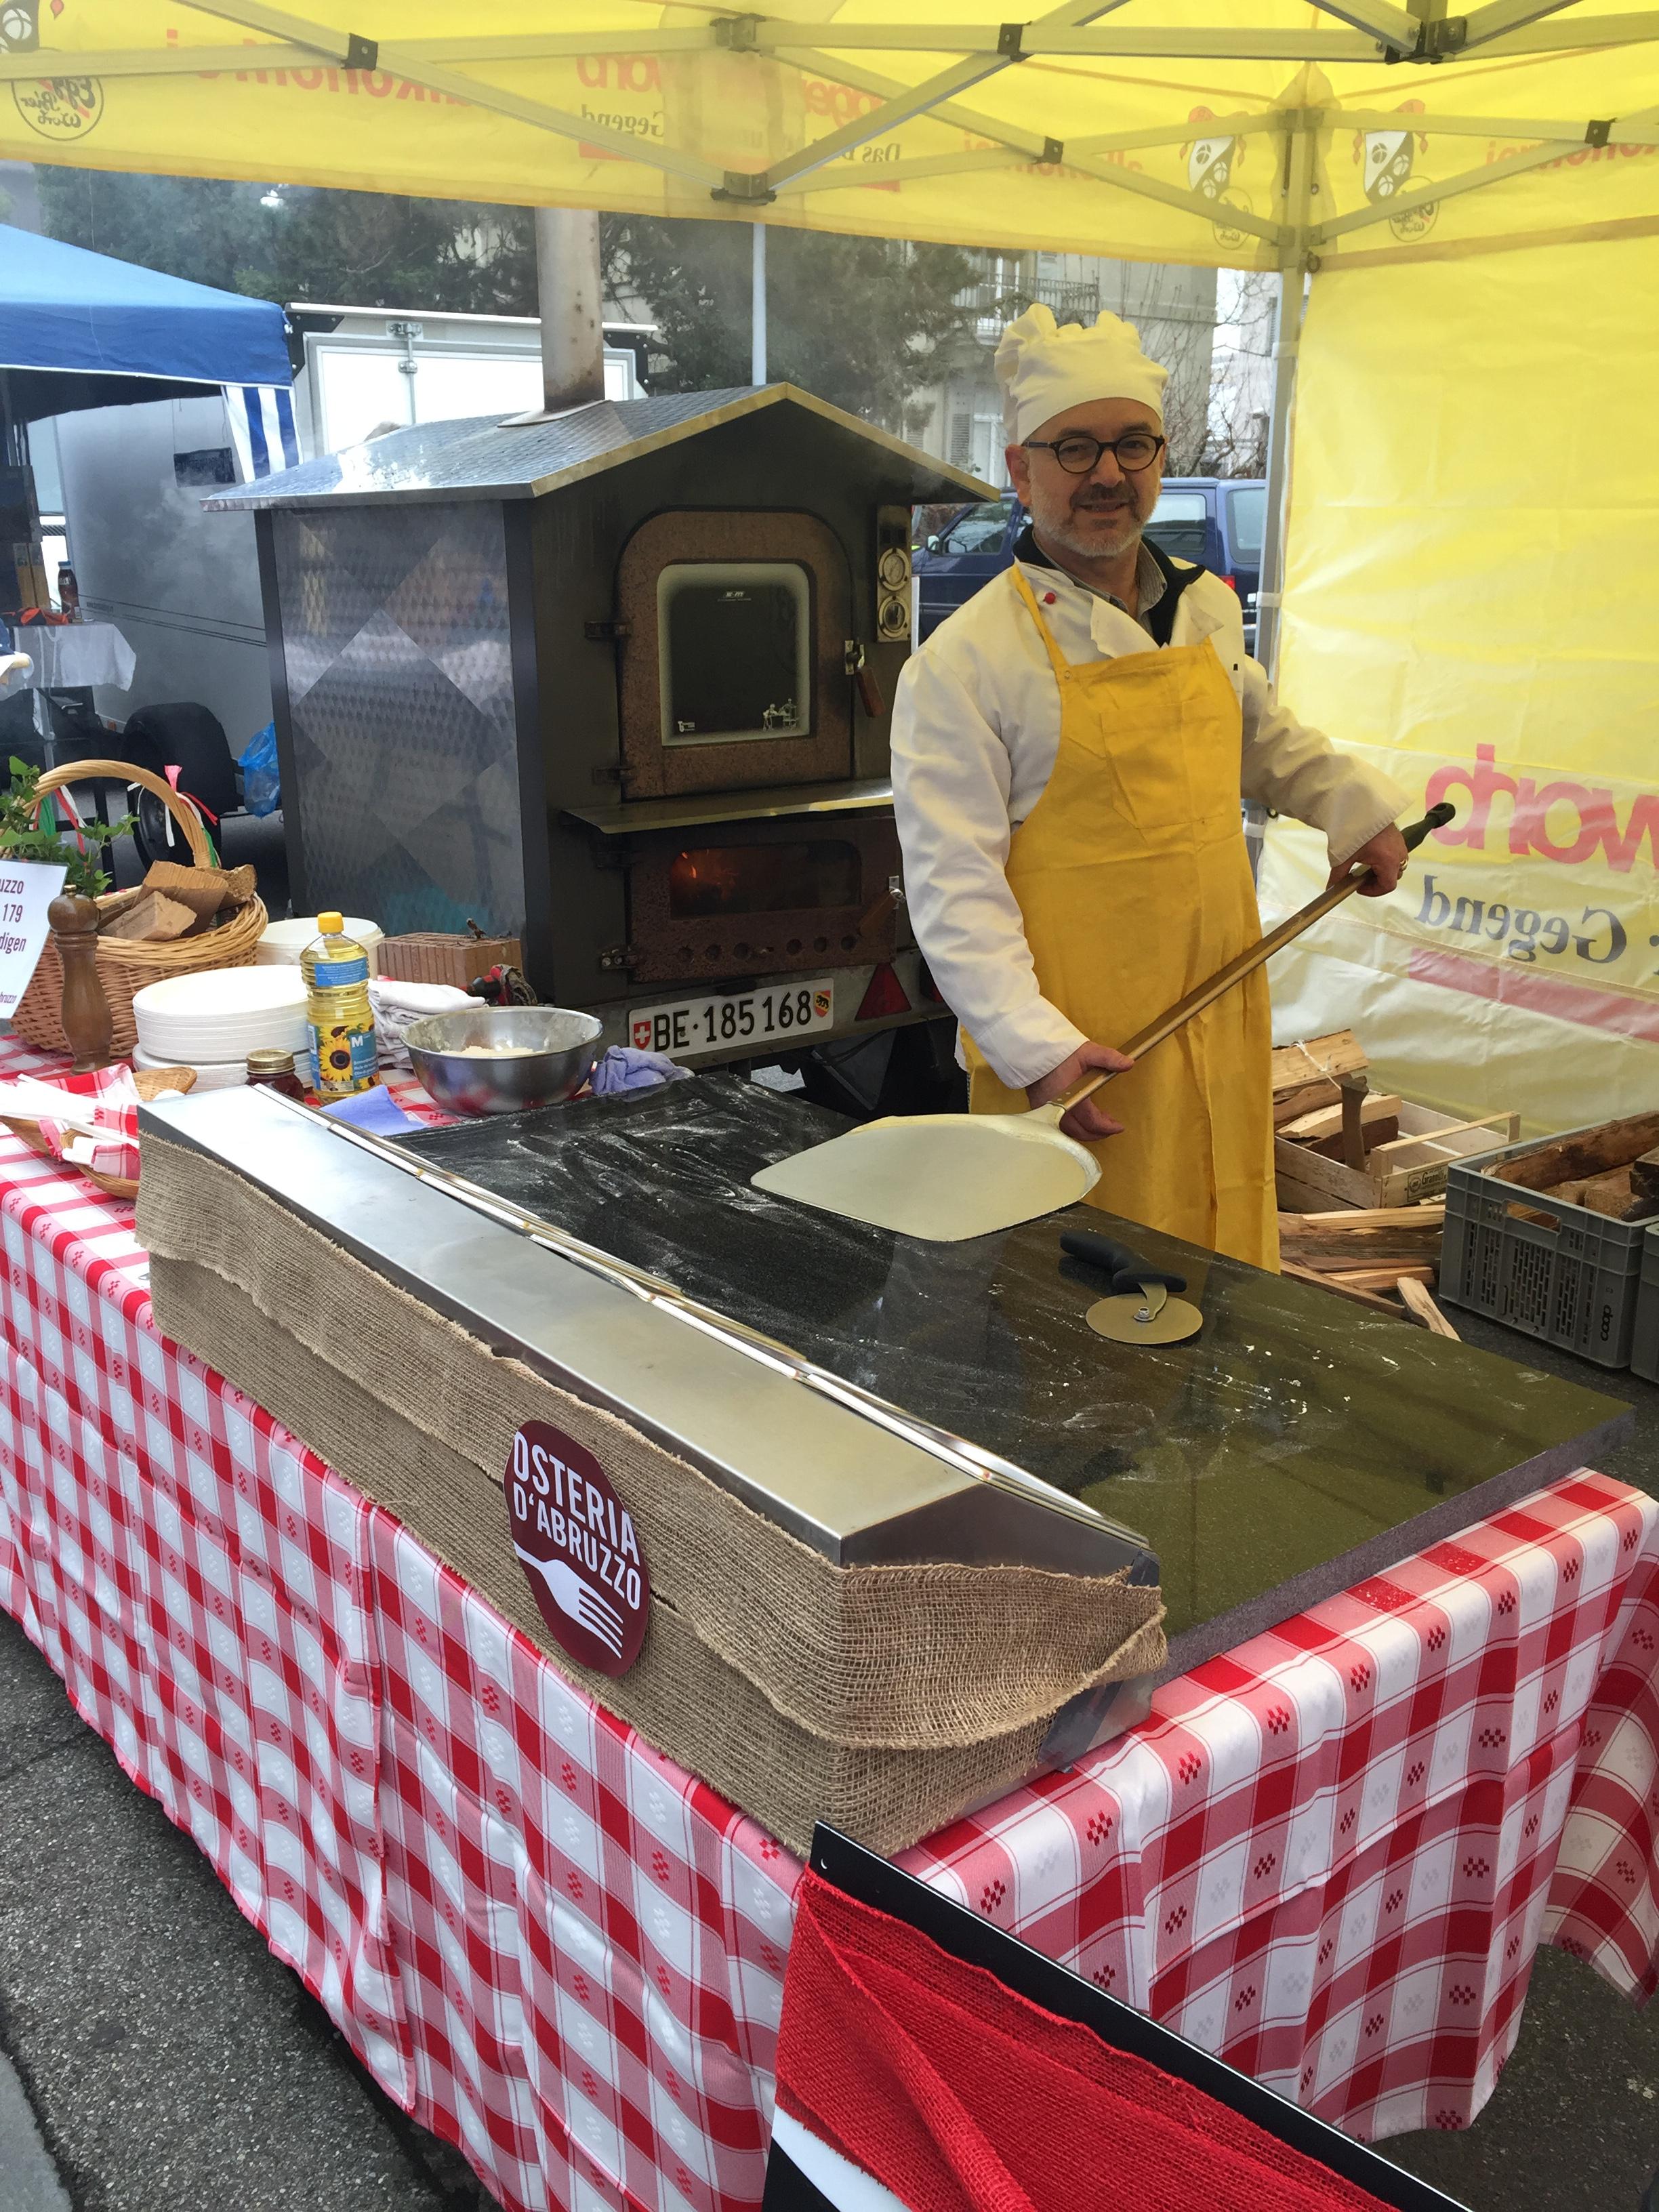 Raffaele - Chef und Pizzaiolo